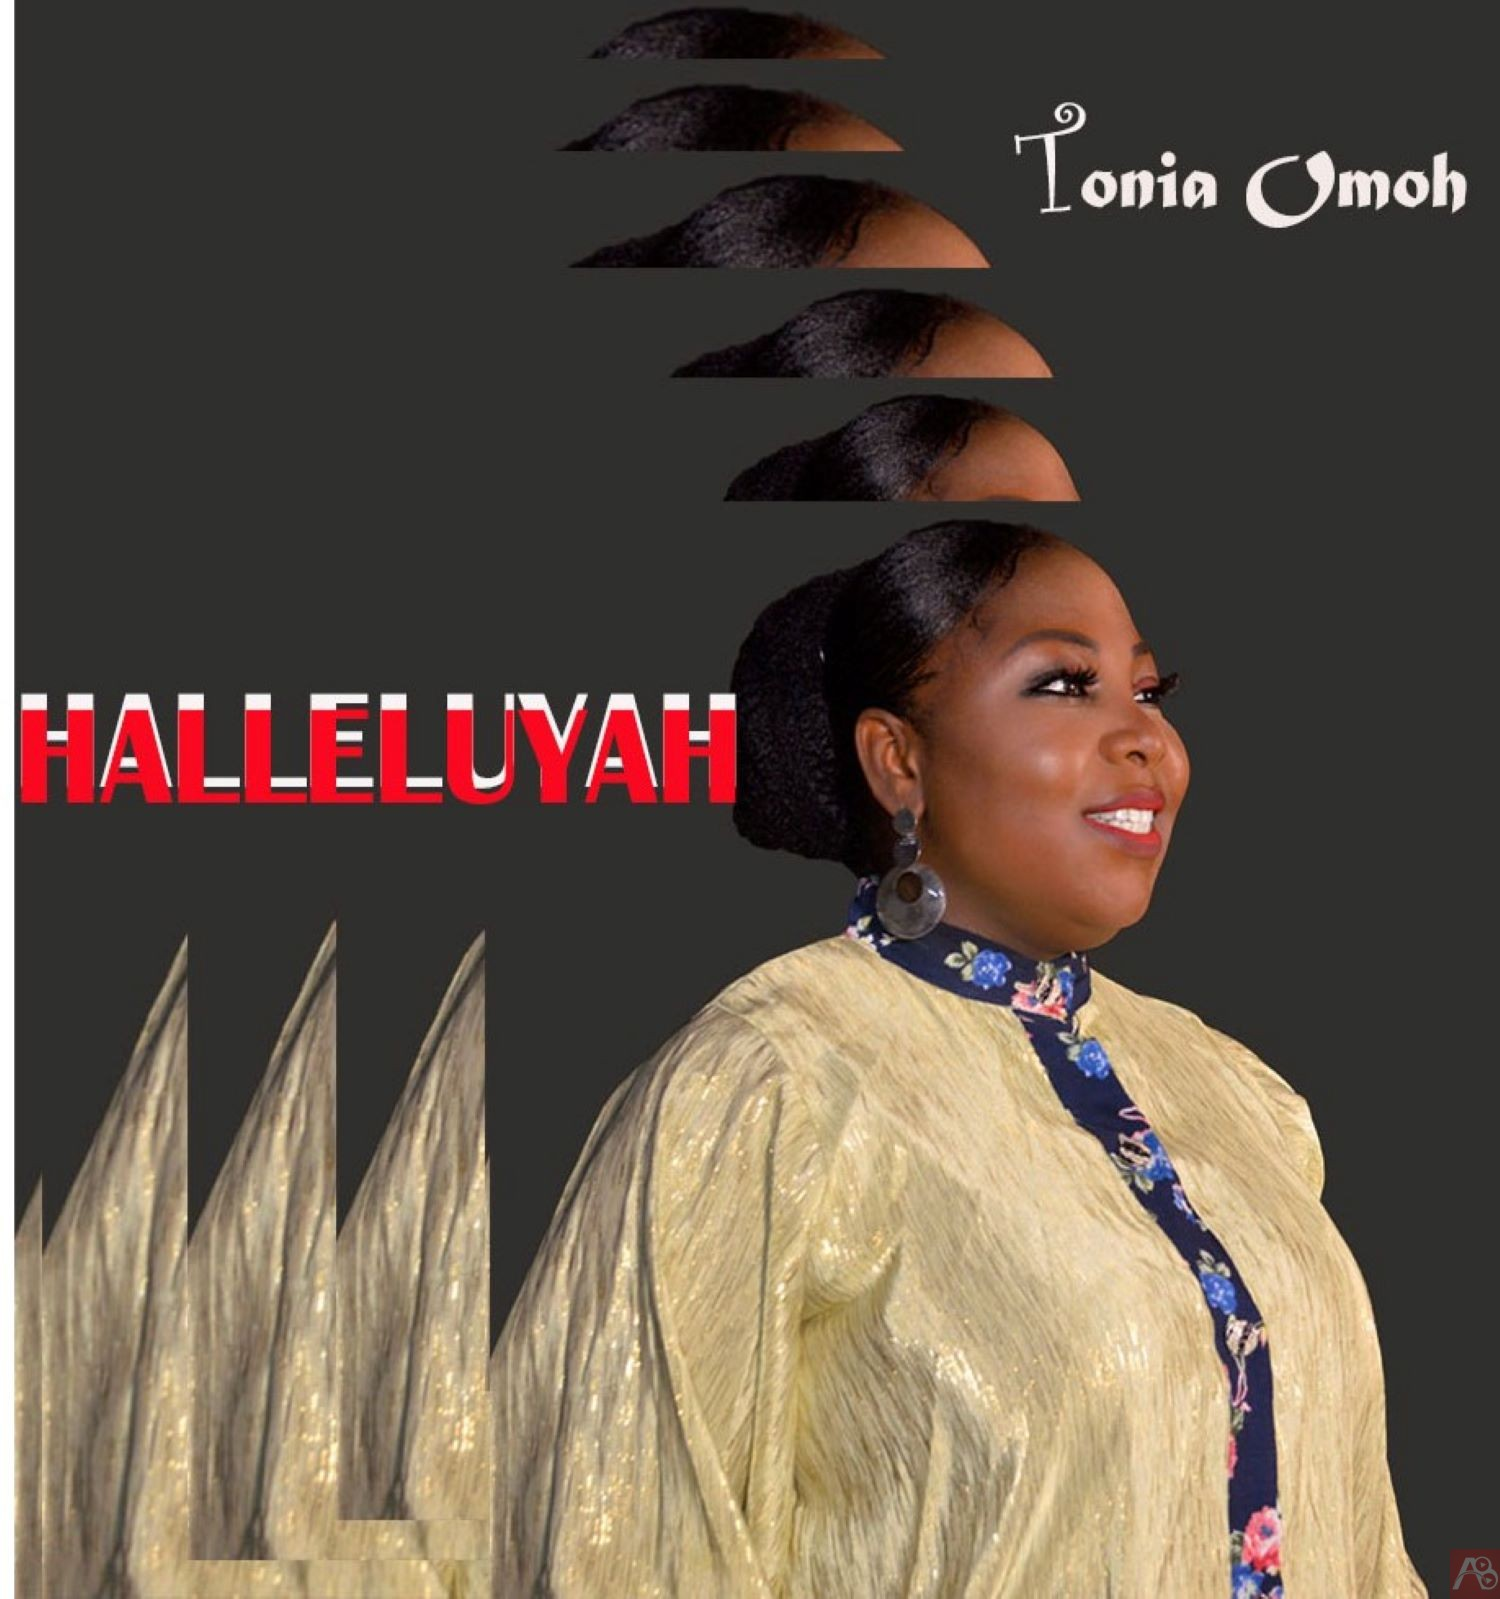 Tonia Omoh Halleluyah